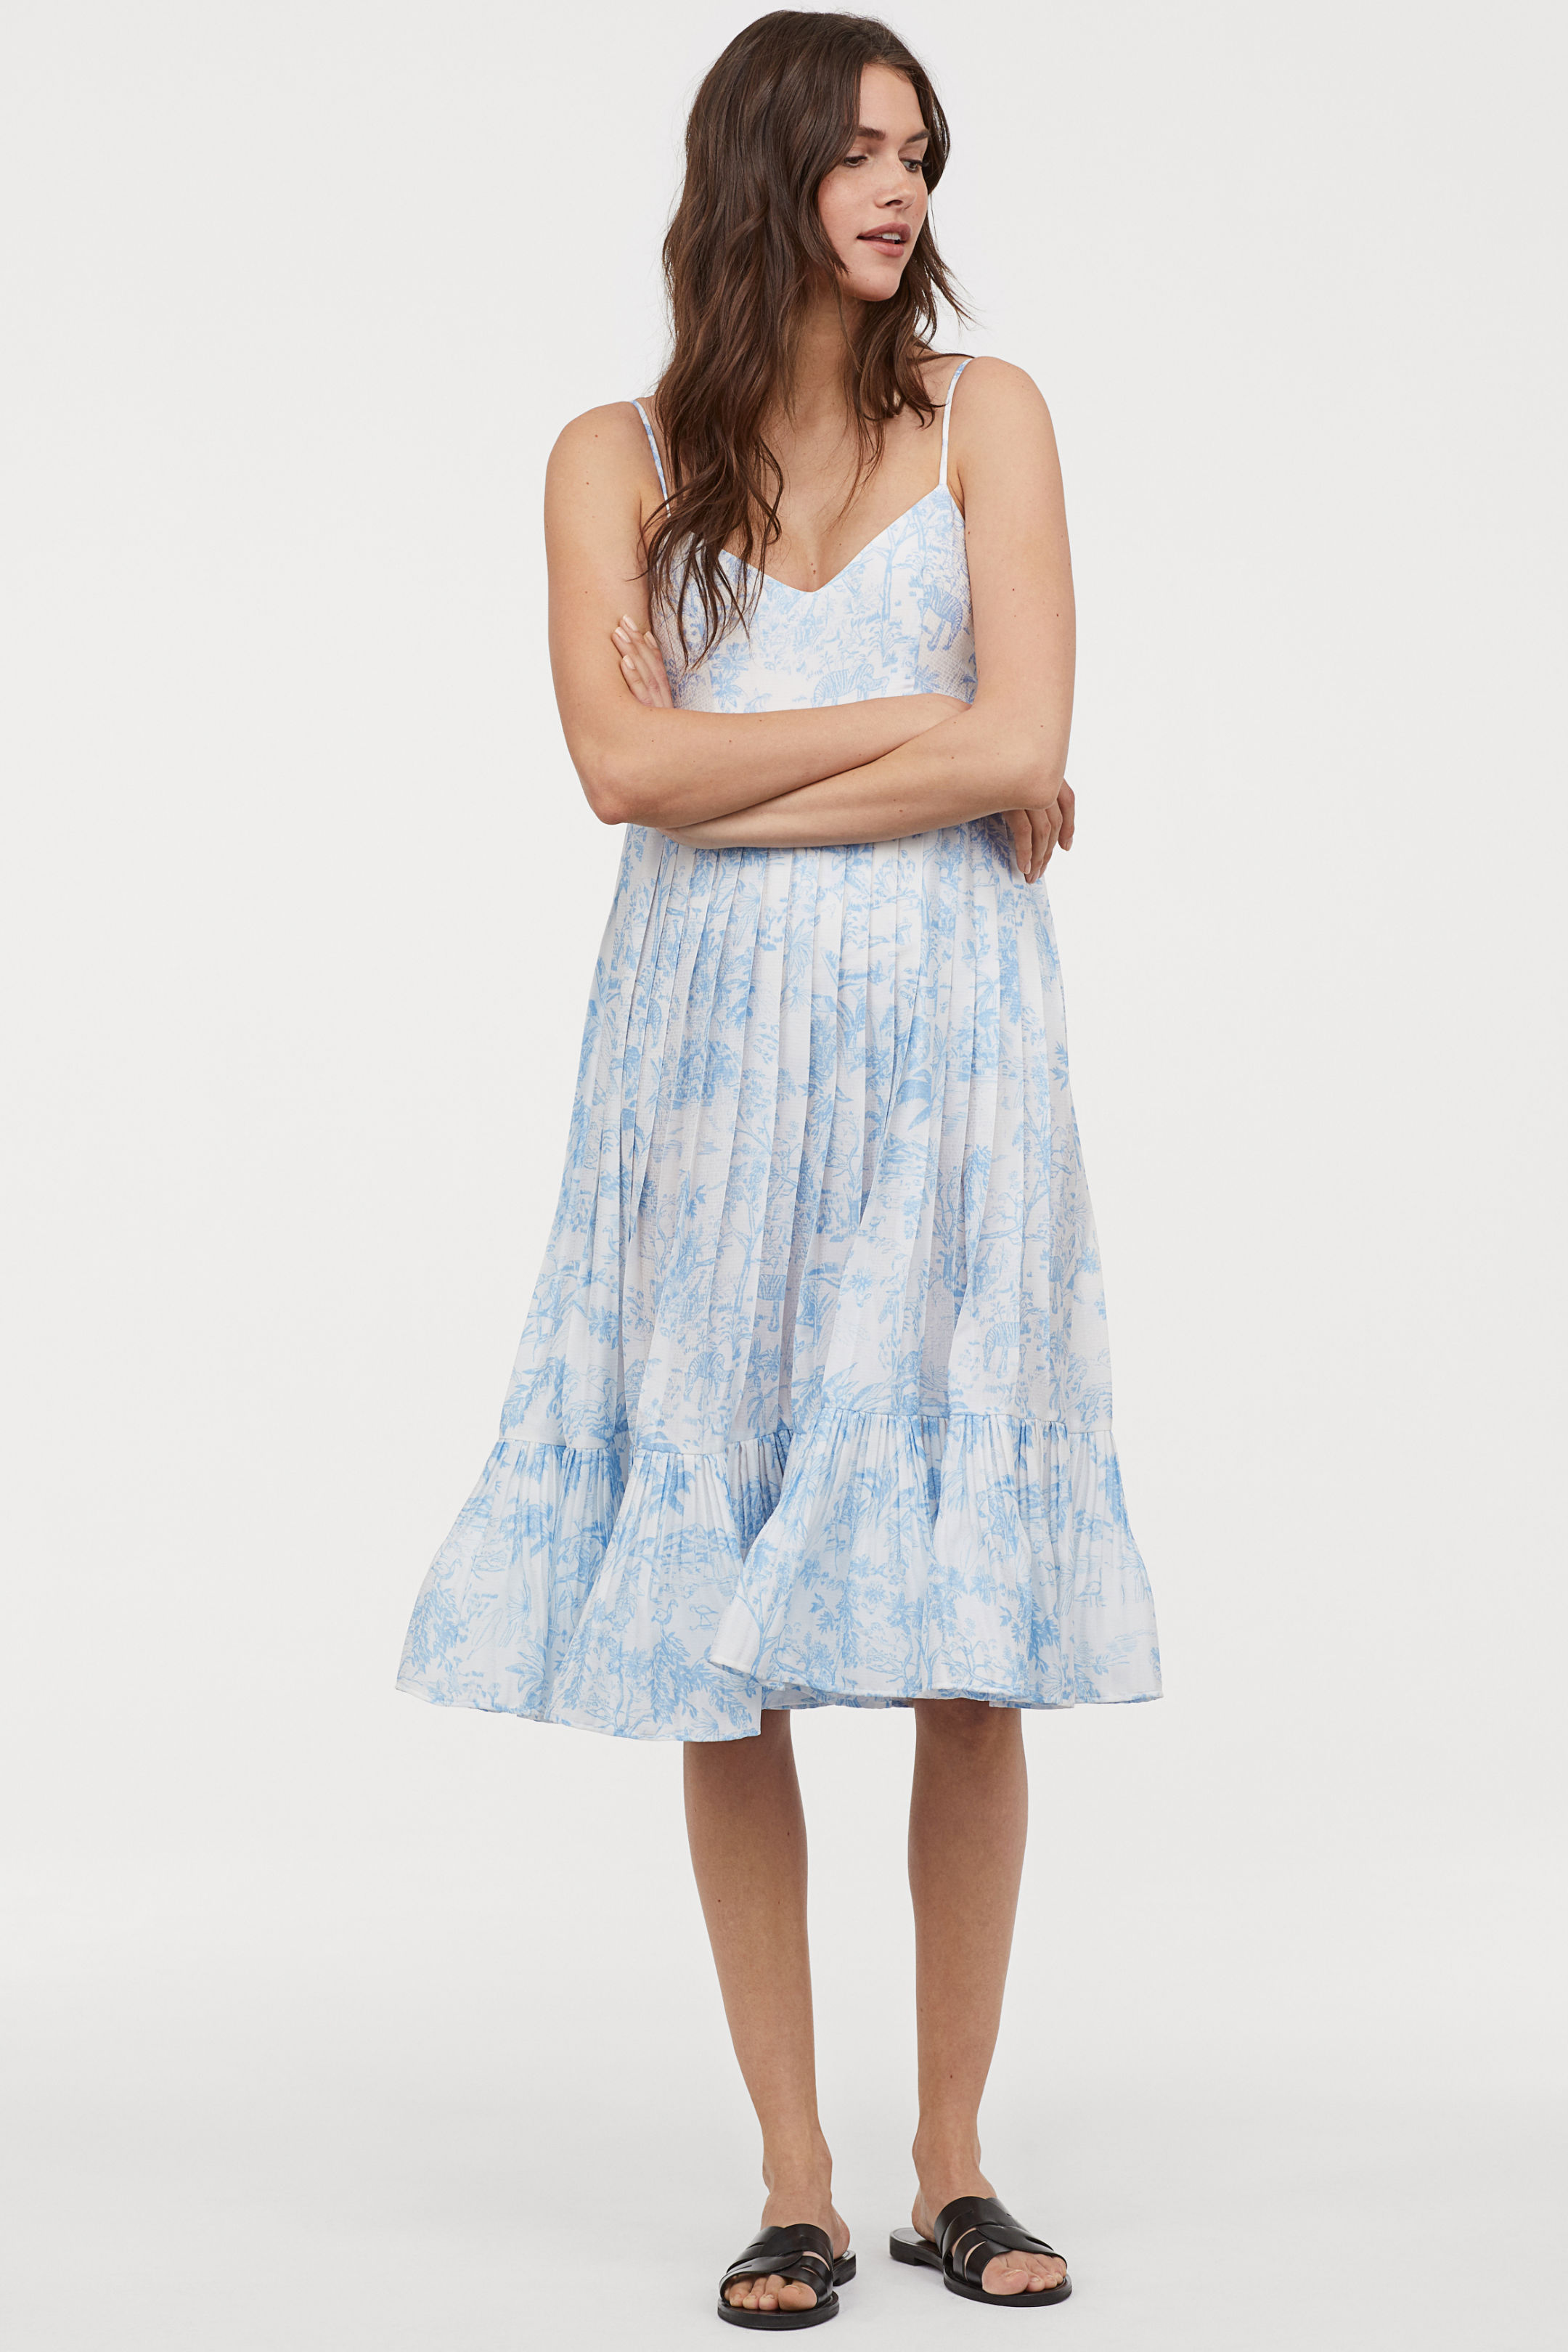 HM Pleated Dress